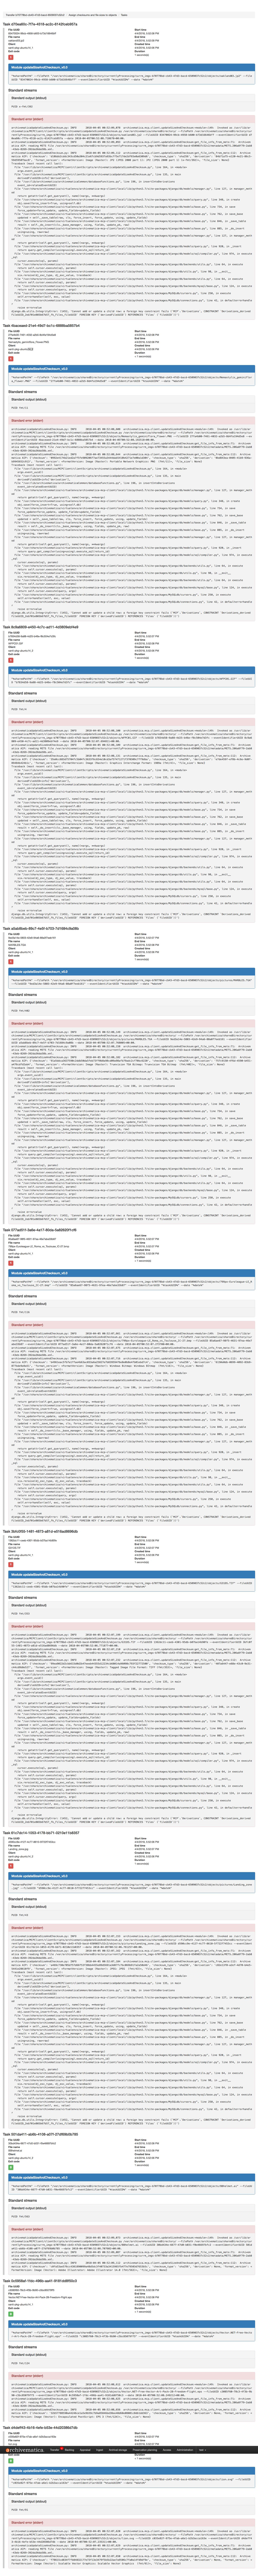 Bug: Full reingest of sample images fails during file UUID